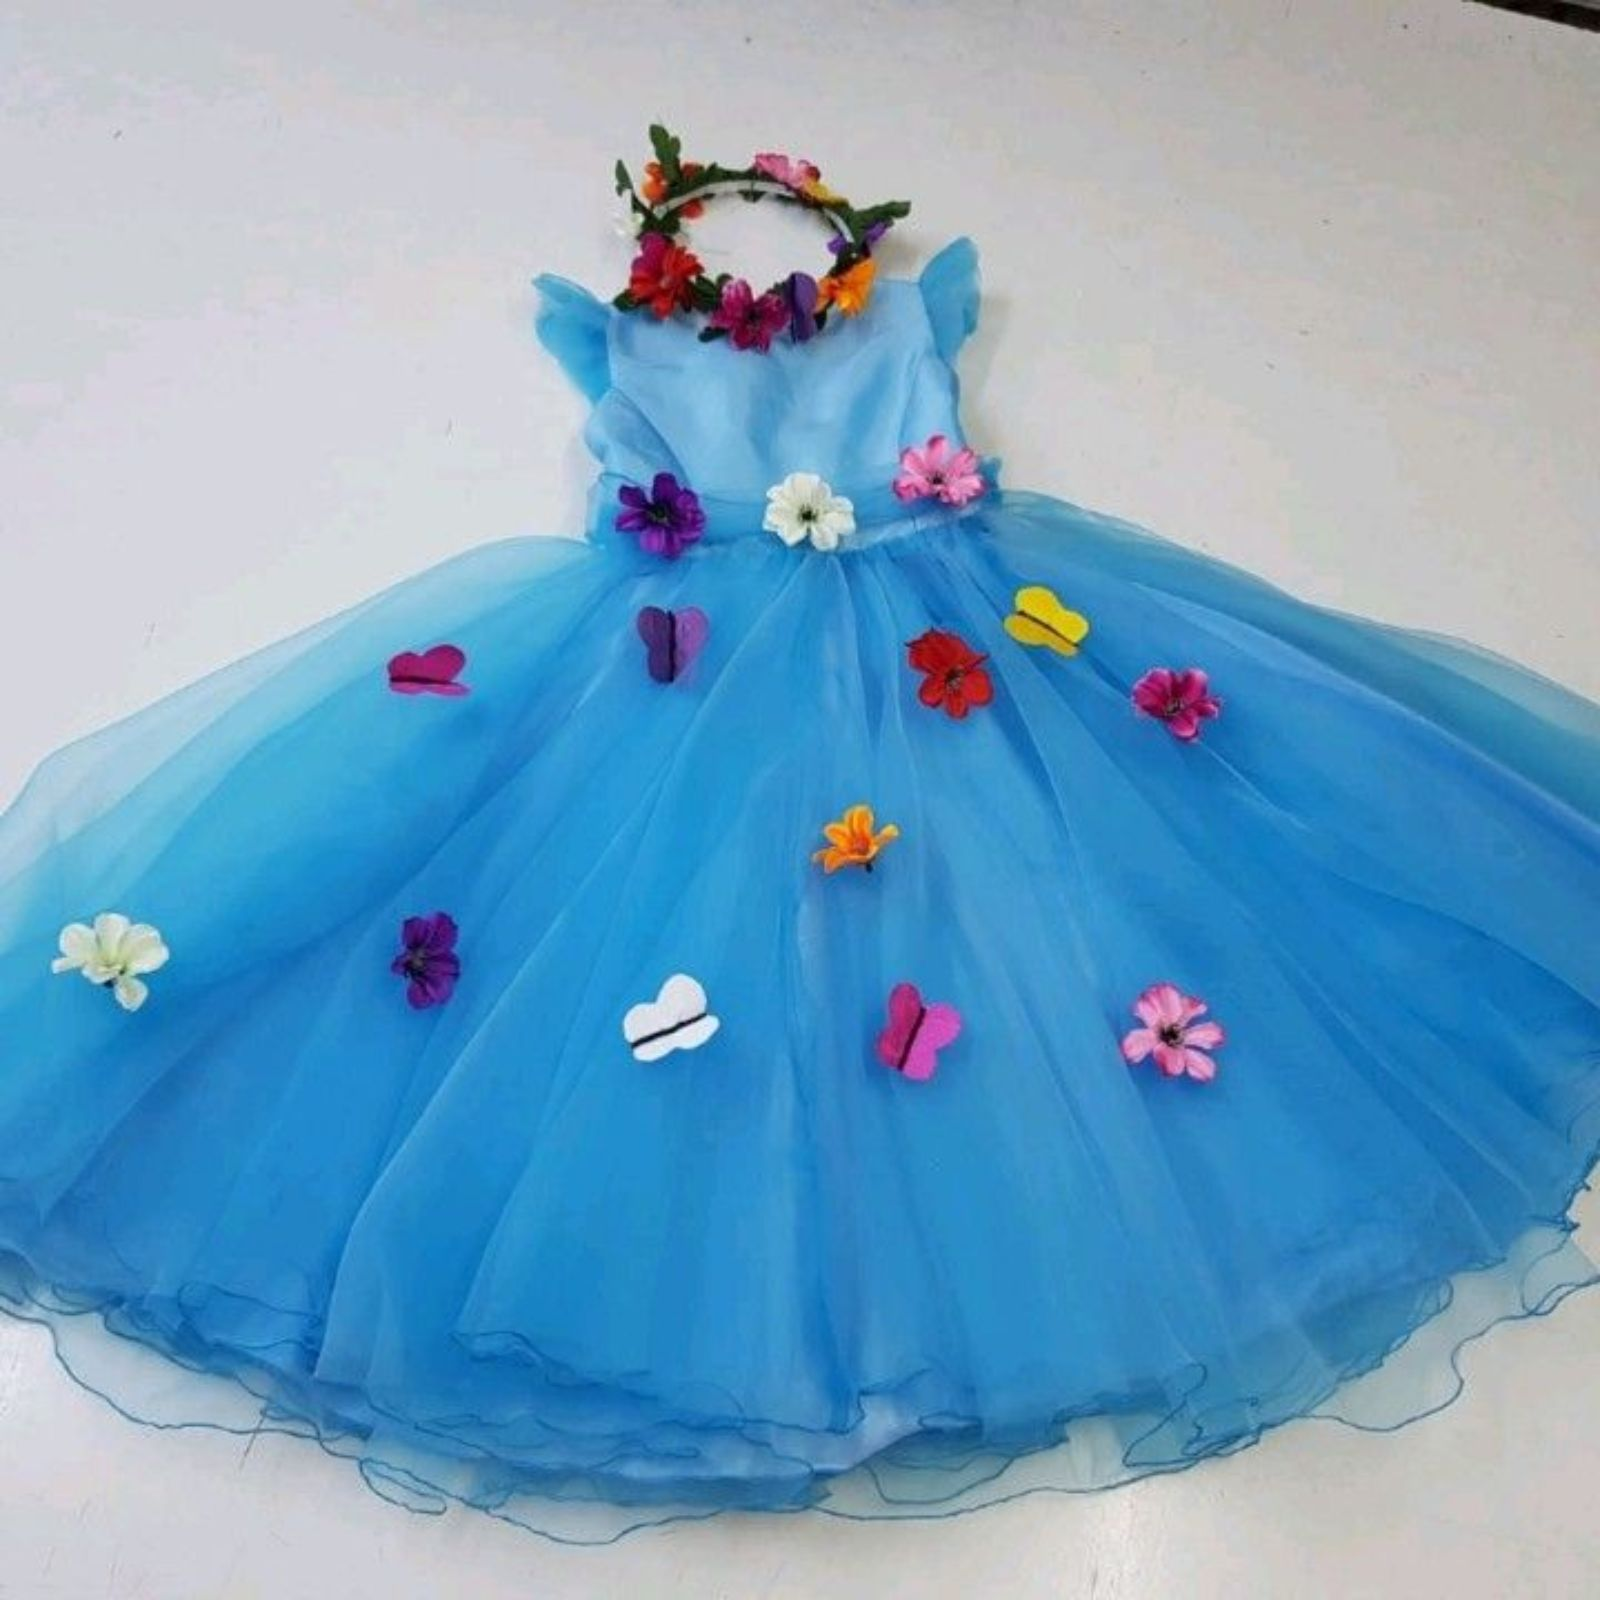 Prințesa bleu cu flori și fluturași 1